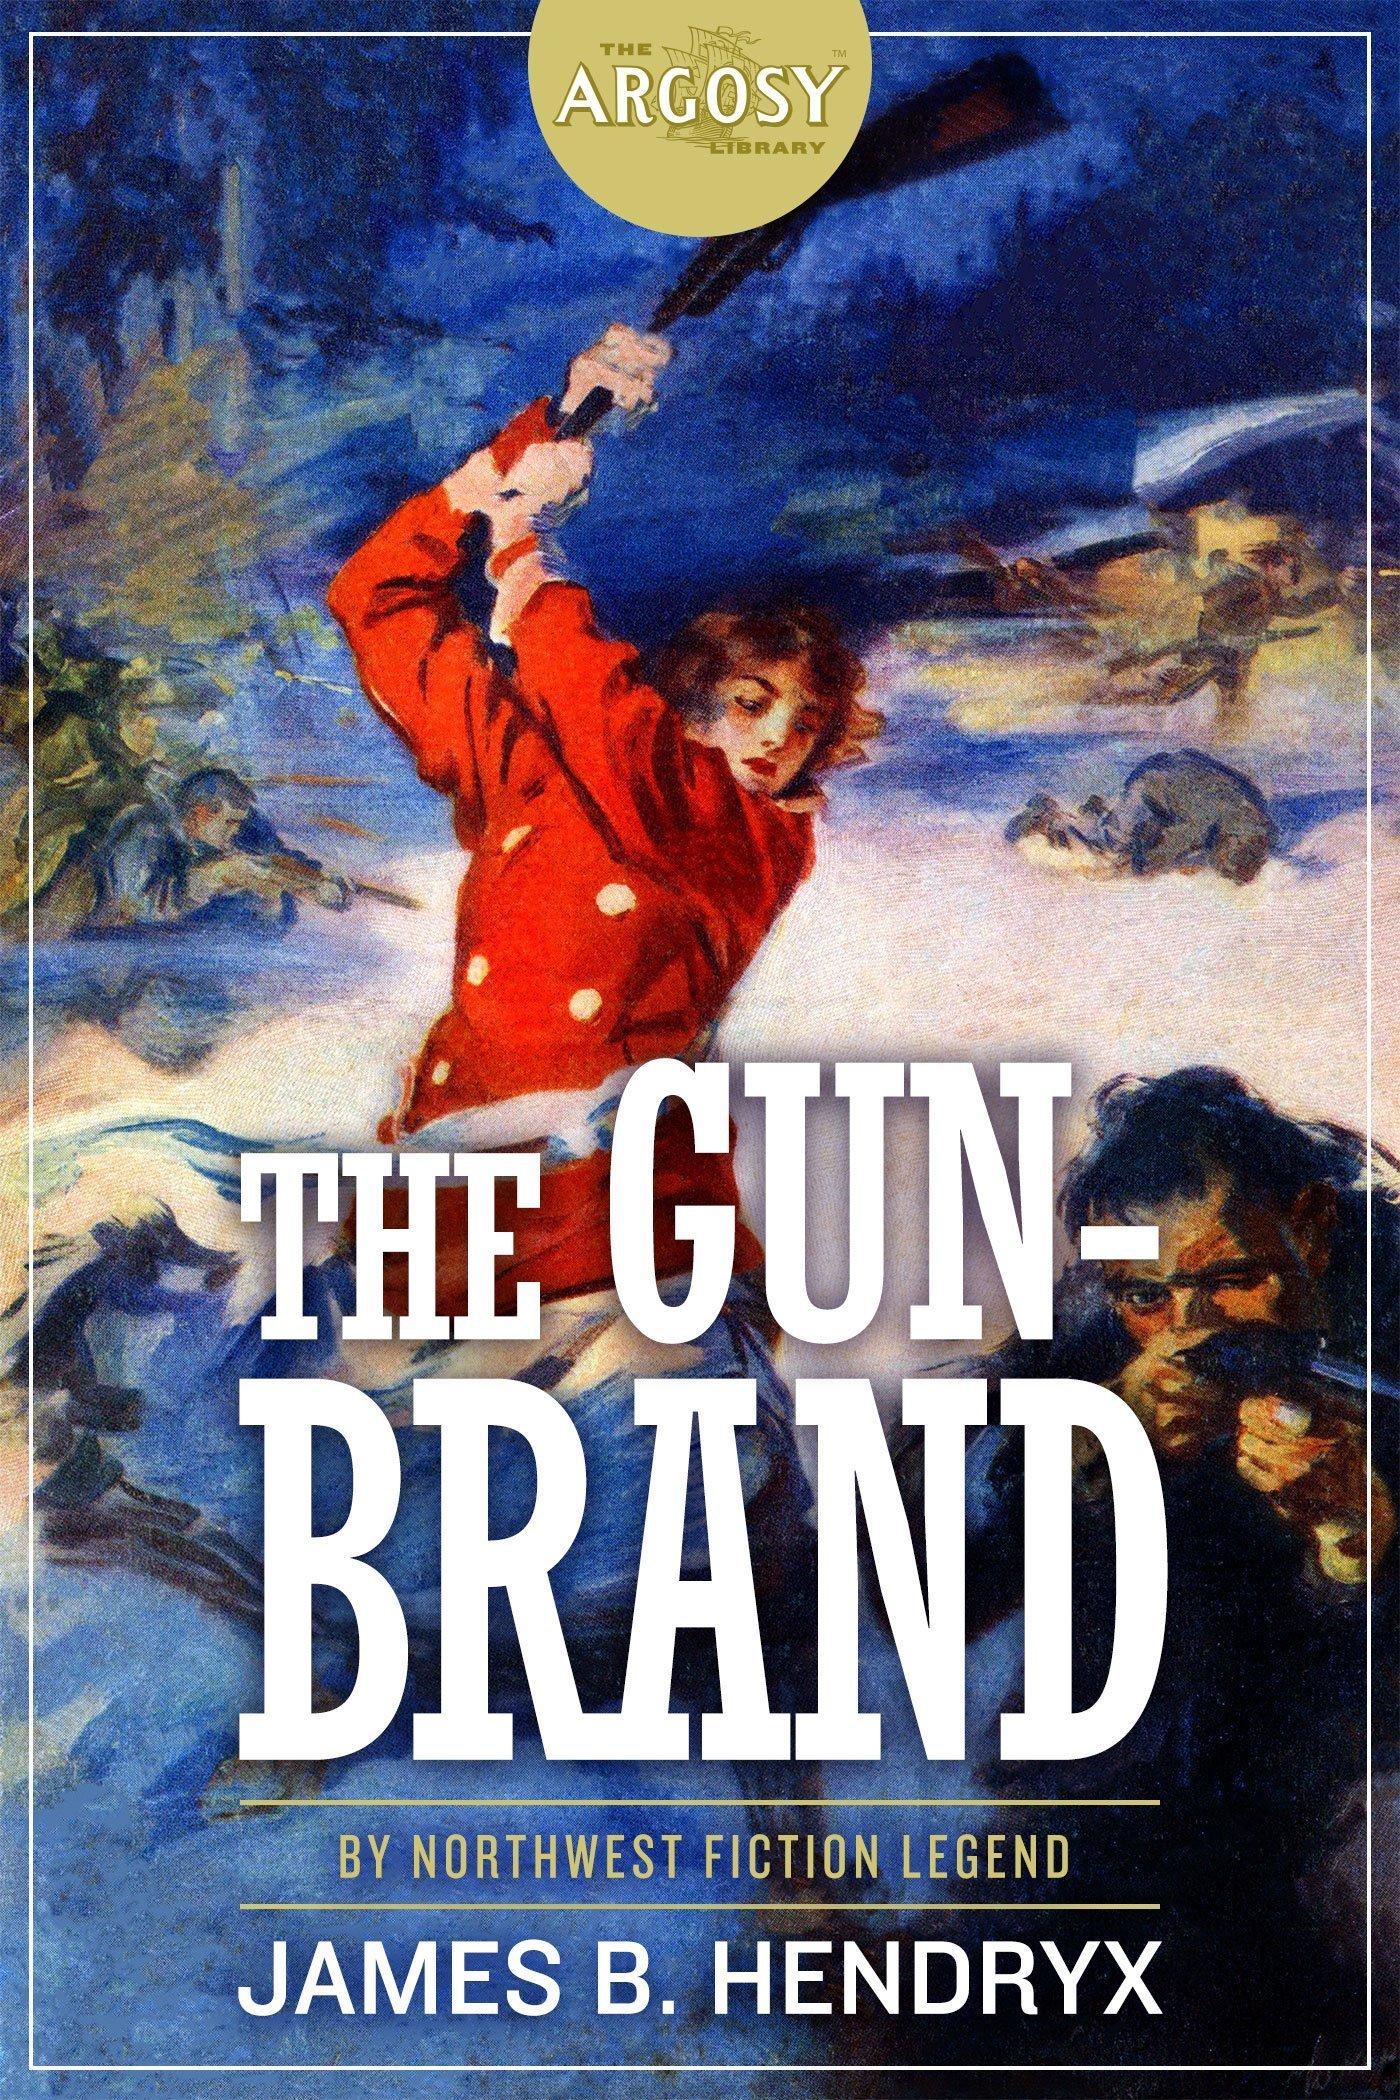 The Gun-Brand (The Argosy Library) by James B. Hendryx